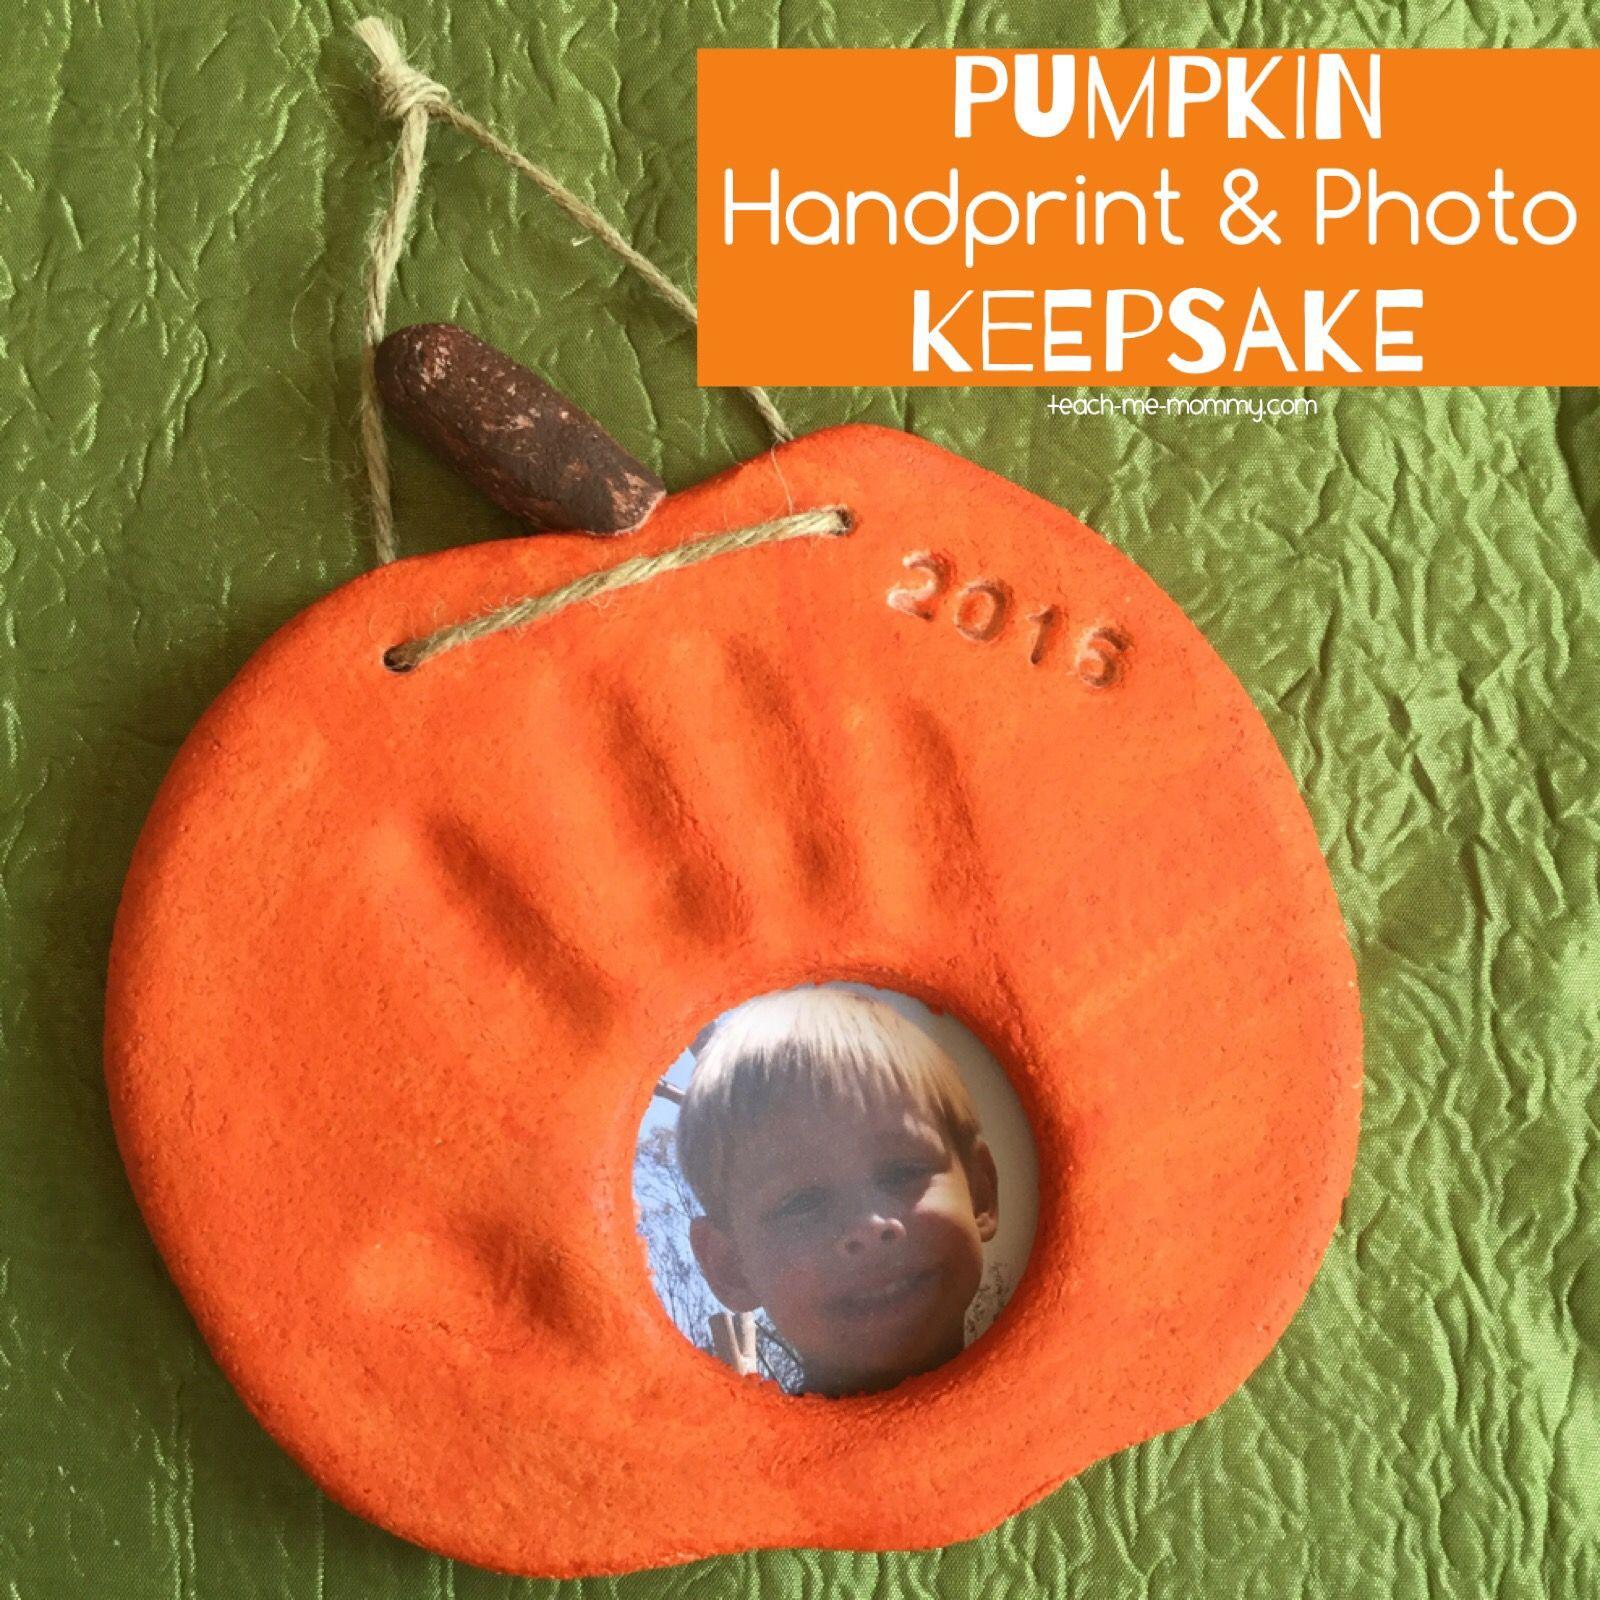 Pumpkin Handprint & Photo Keepsake #halloweencraftsfortoddlers